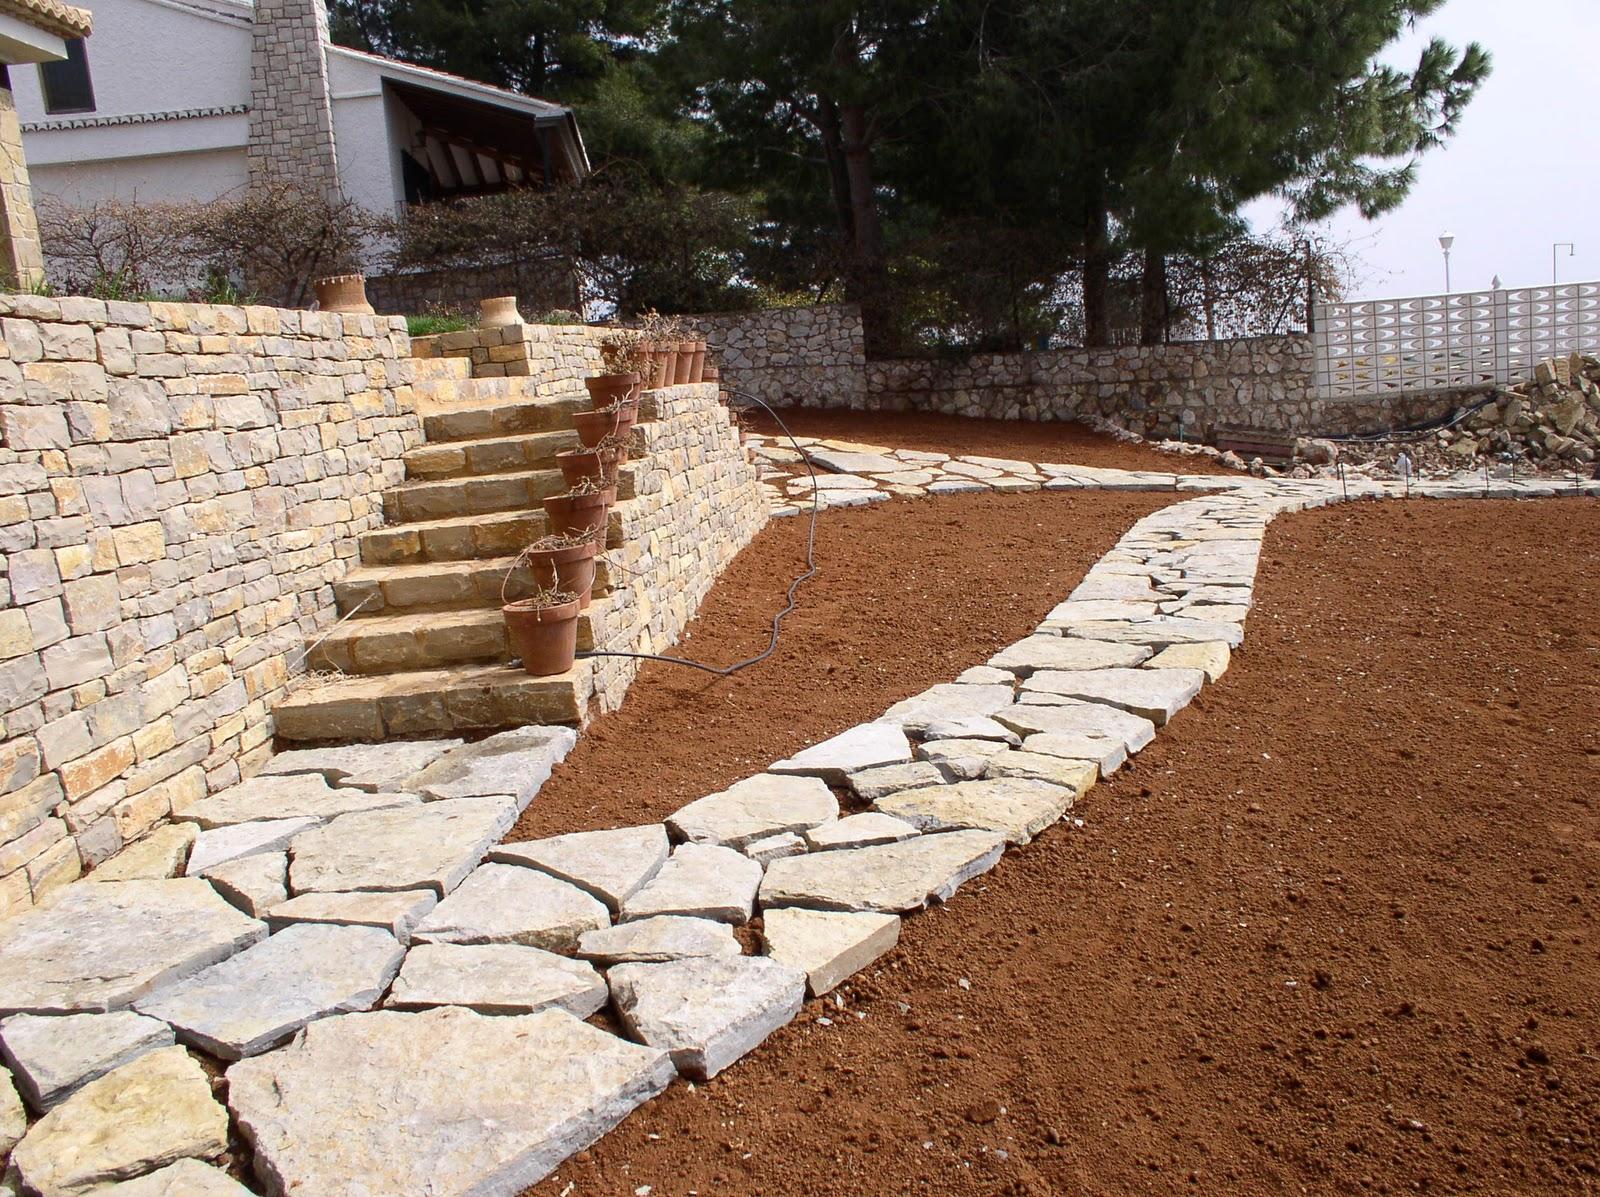 Tu jard n con piedra maestrazgo piedramaestrazgo for Jardines en piedra natural